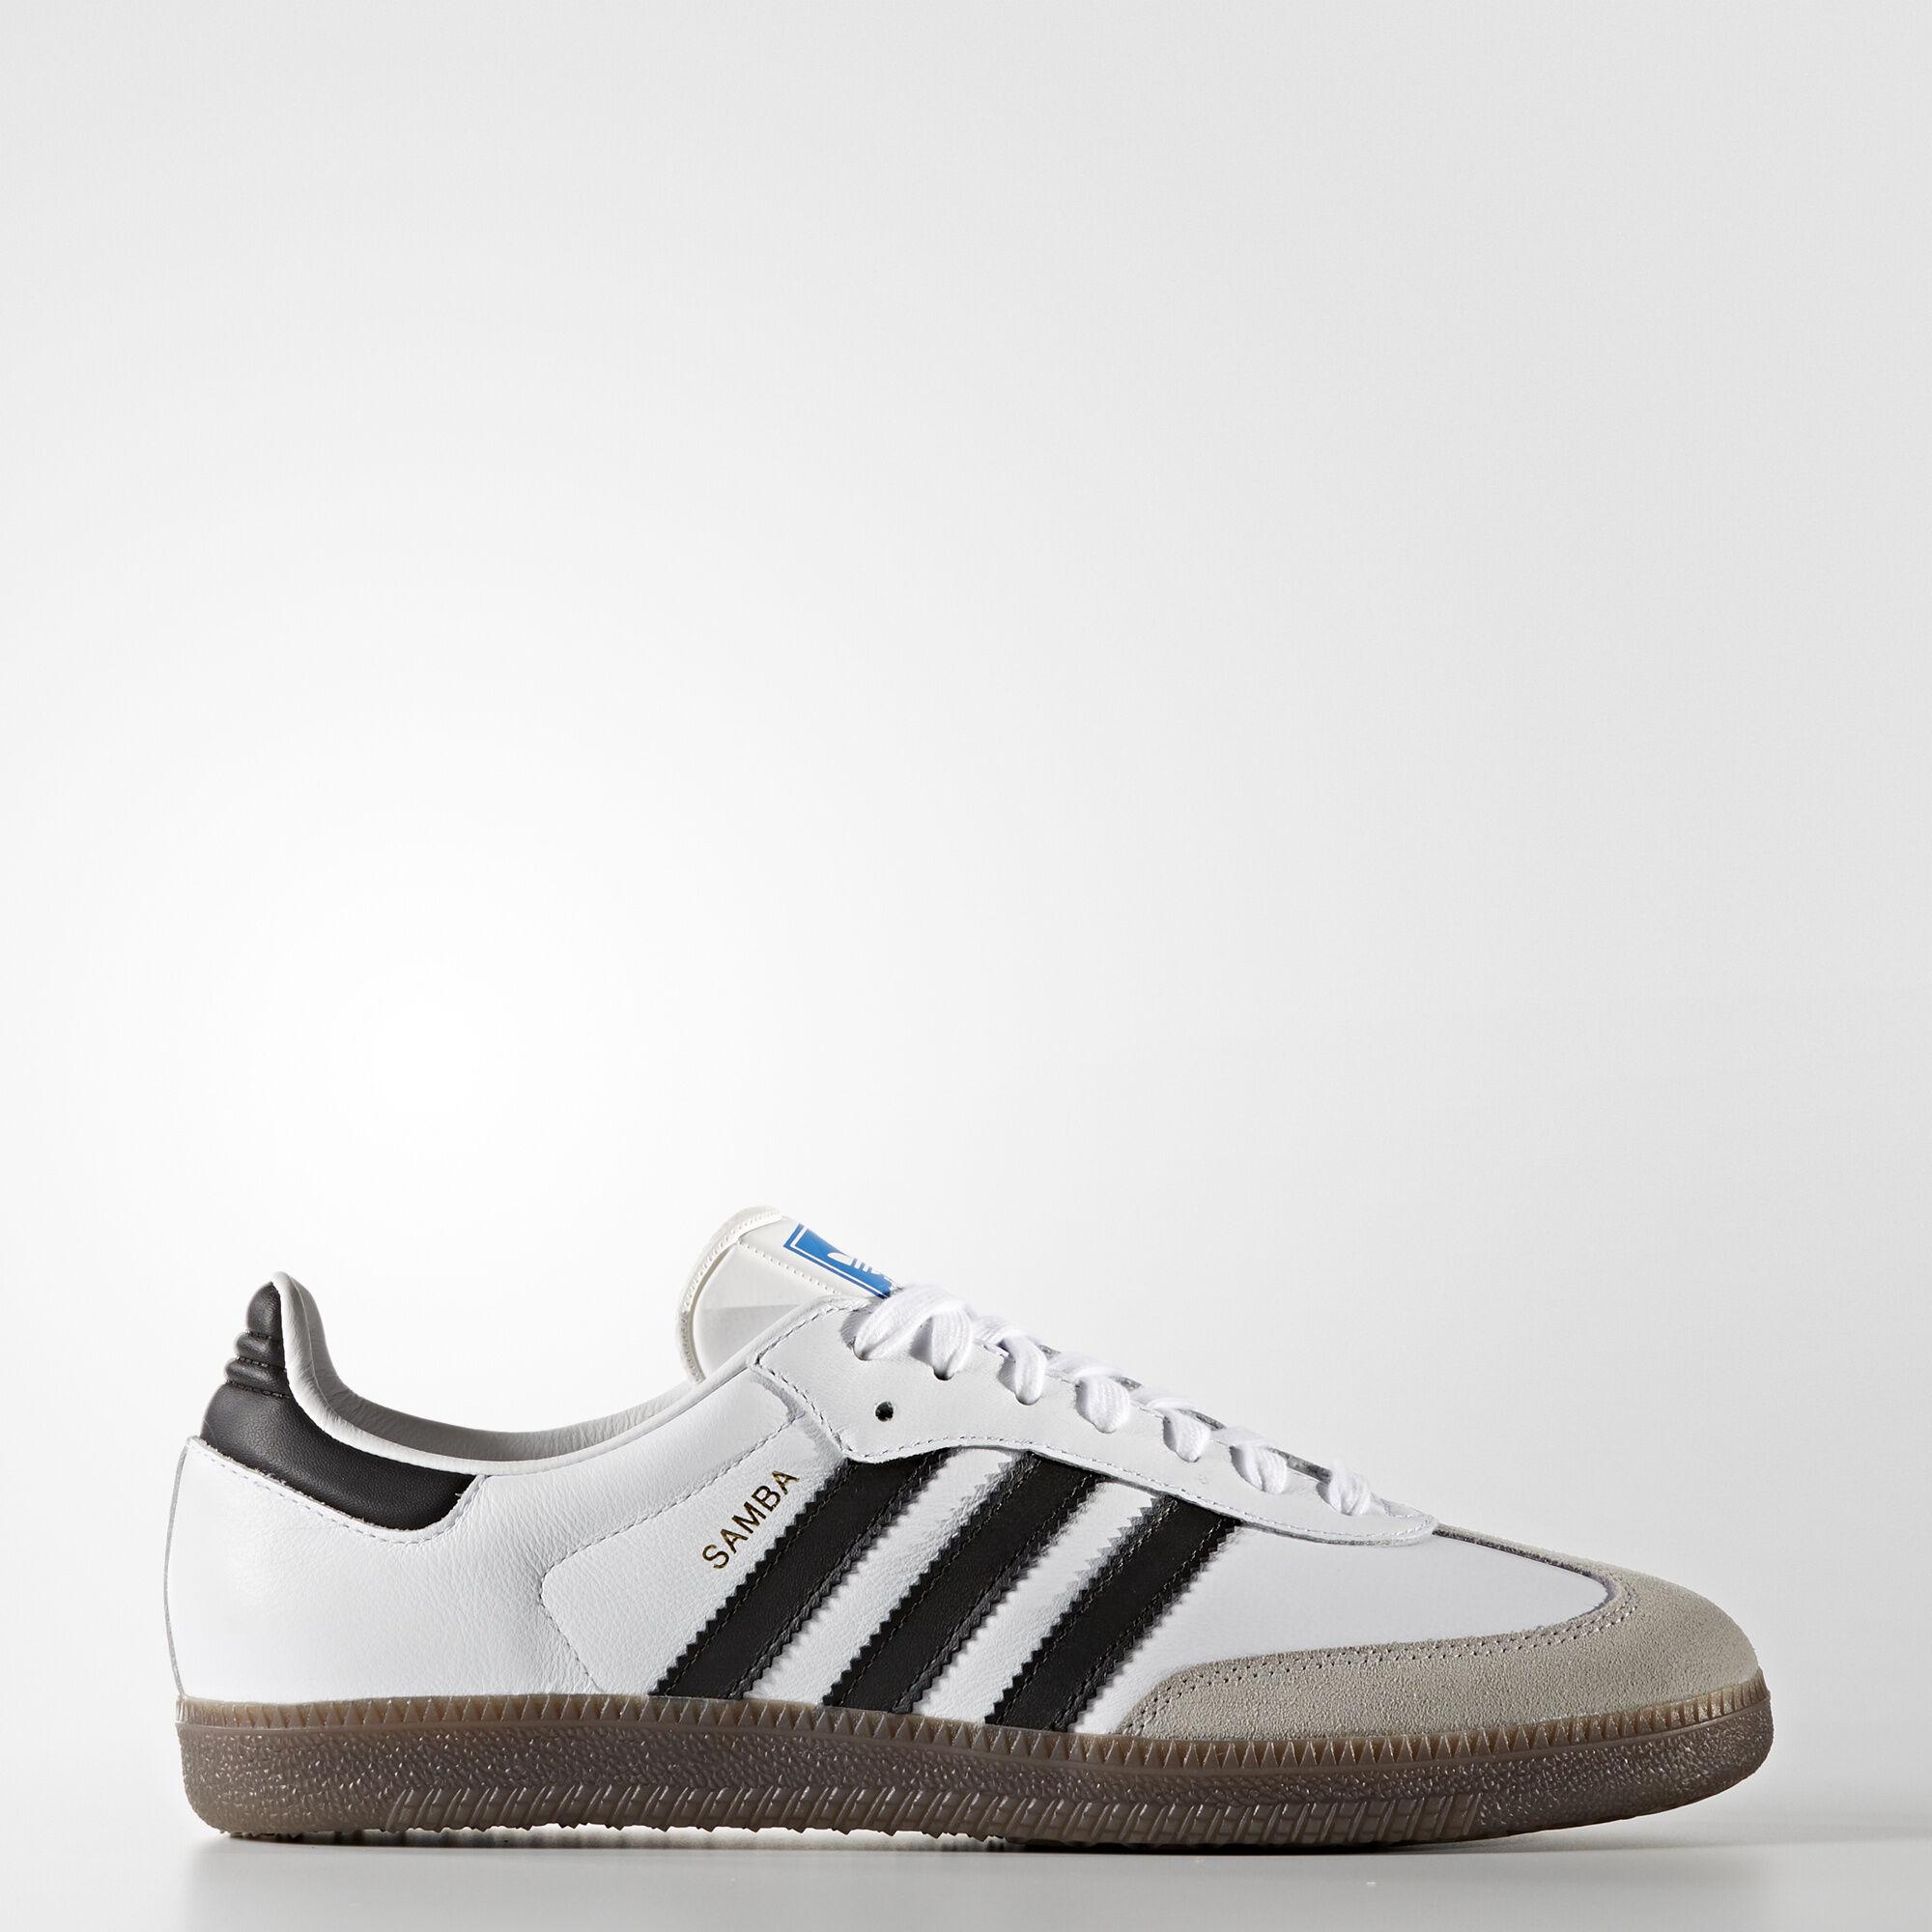 new adidas samba